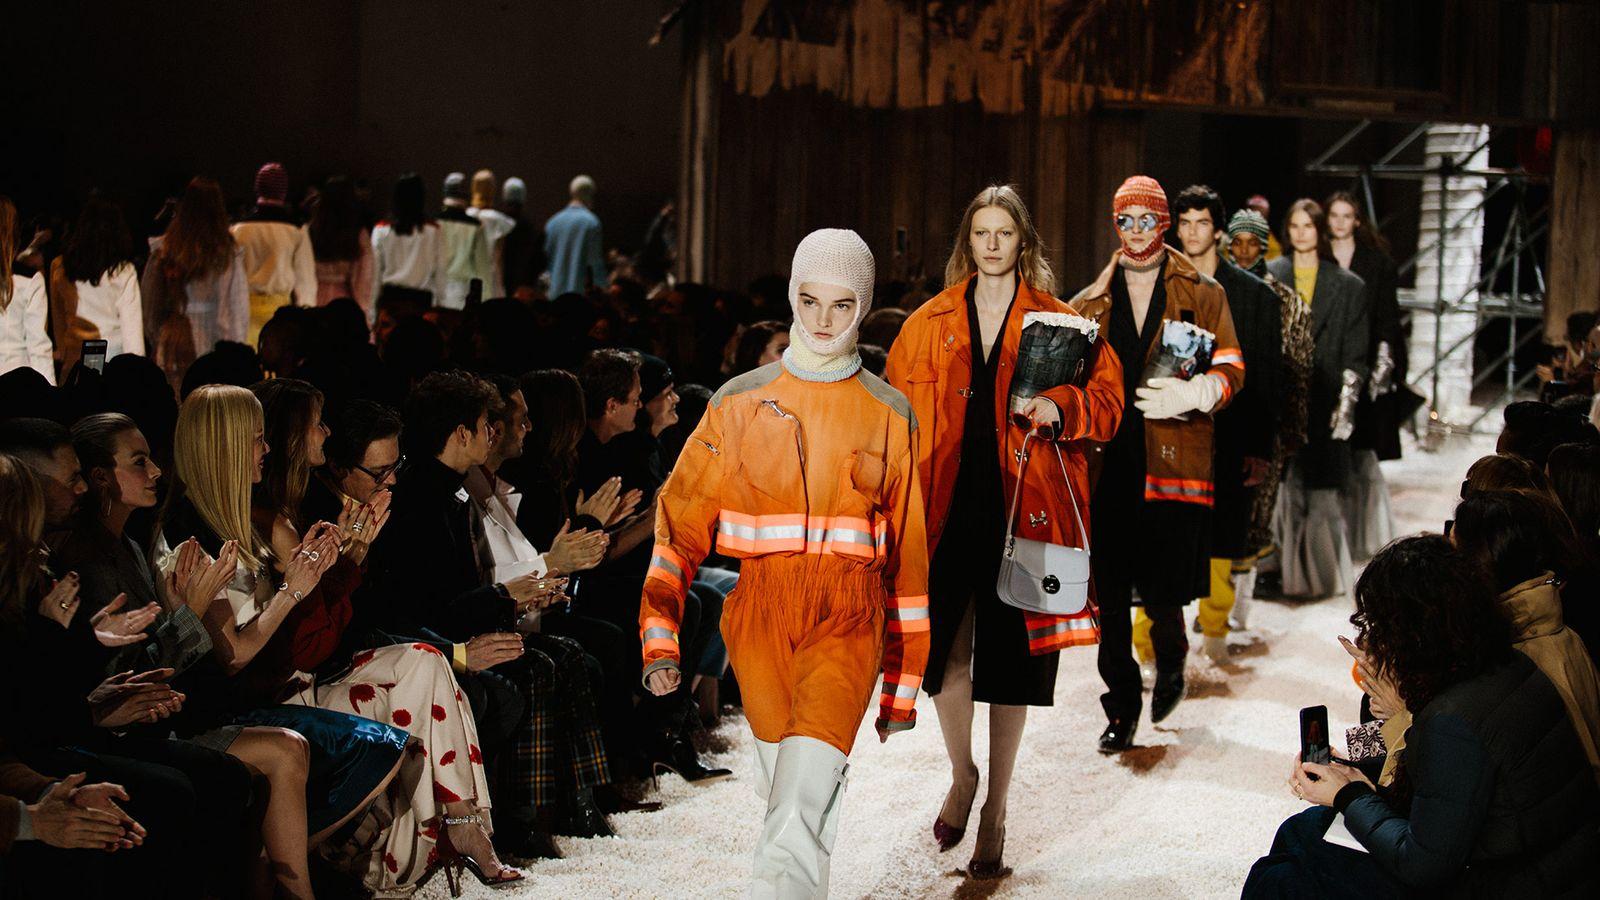 Calvin Klein Fall Winter 2018 Highsnobiety NYFW main Raf Simons fashion shows runway